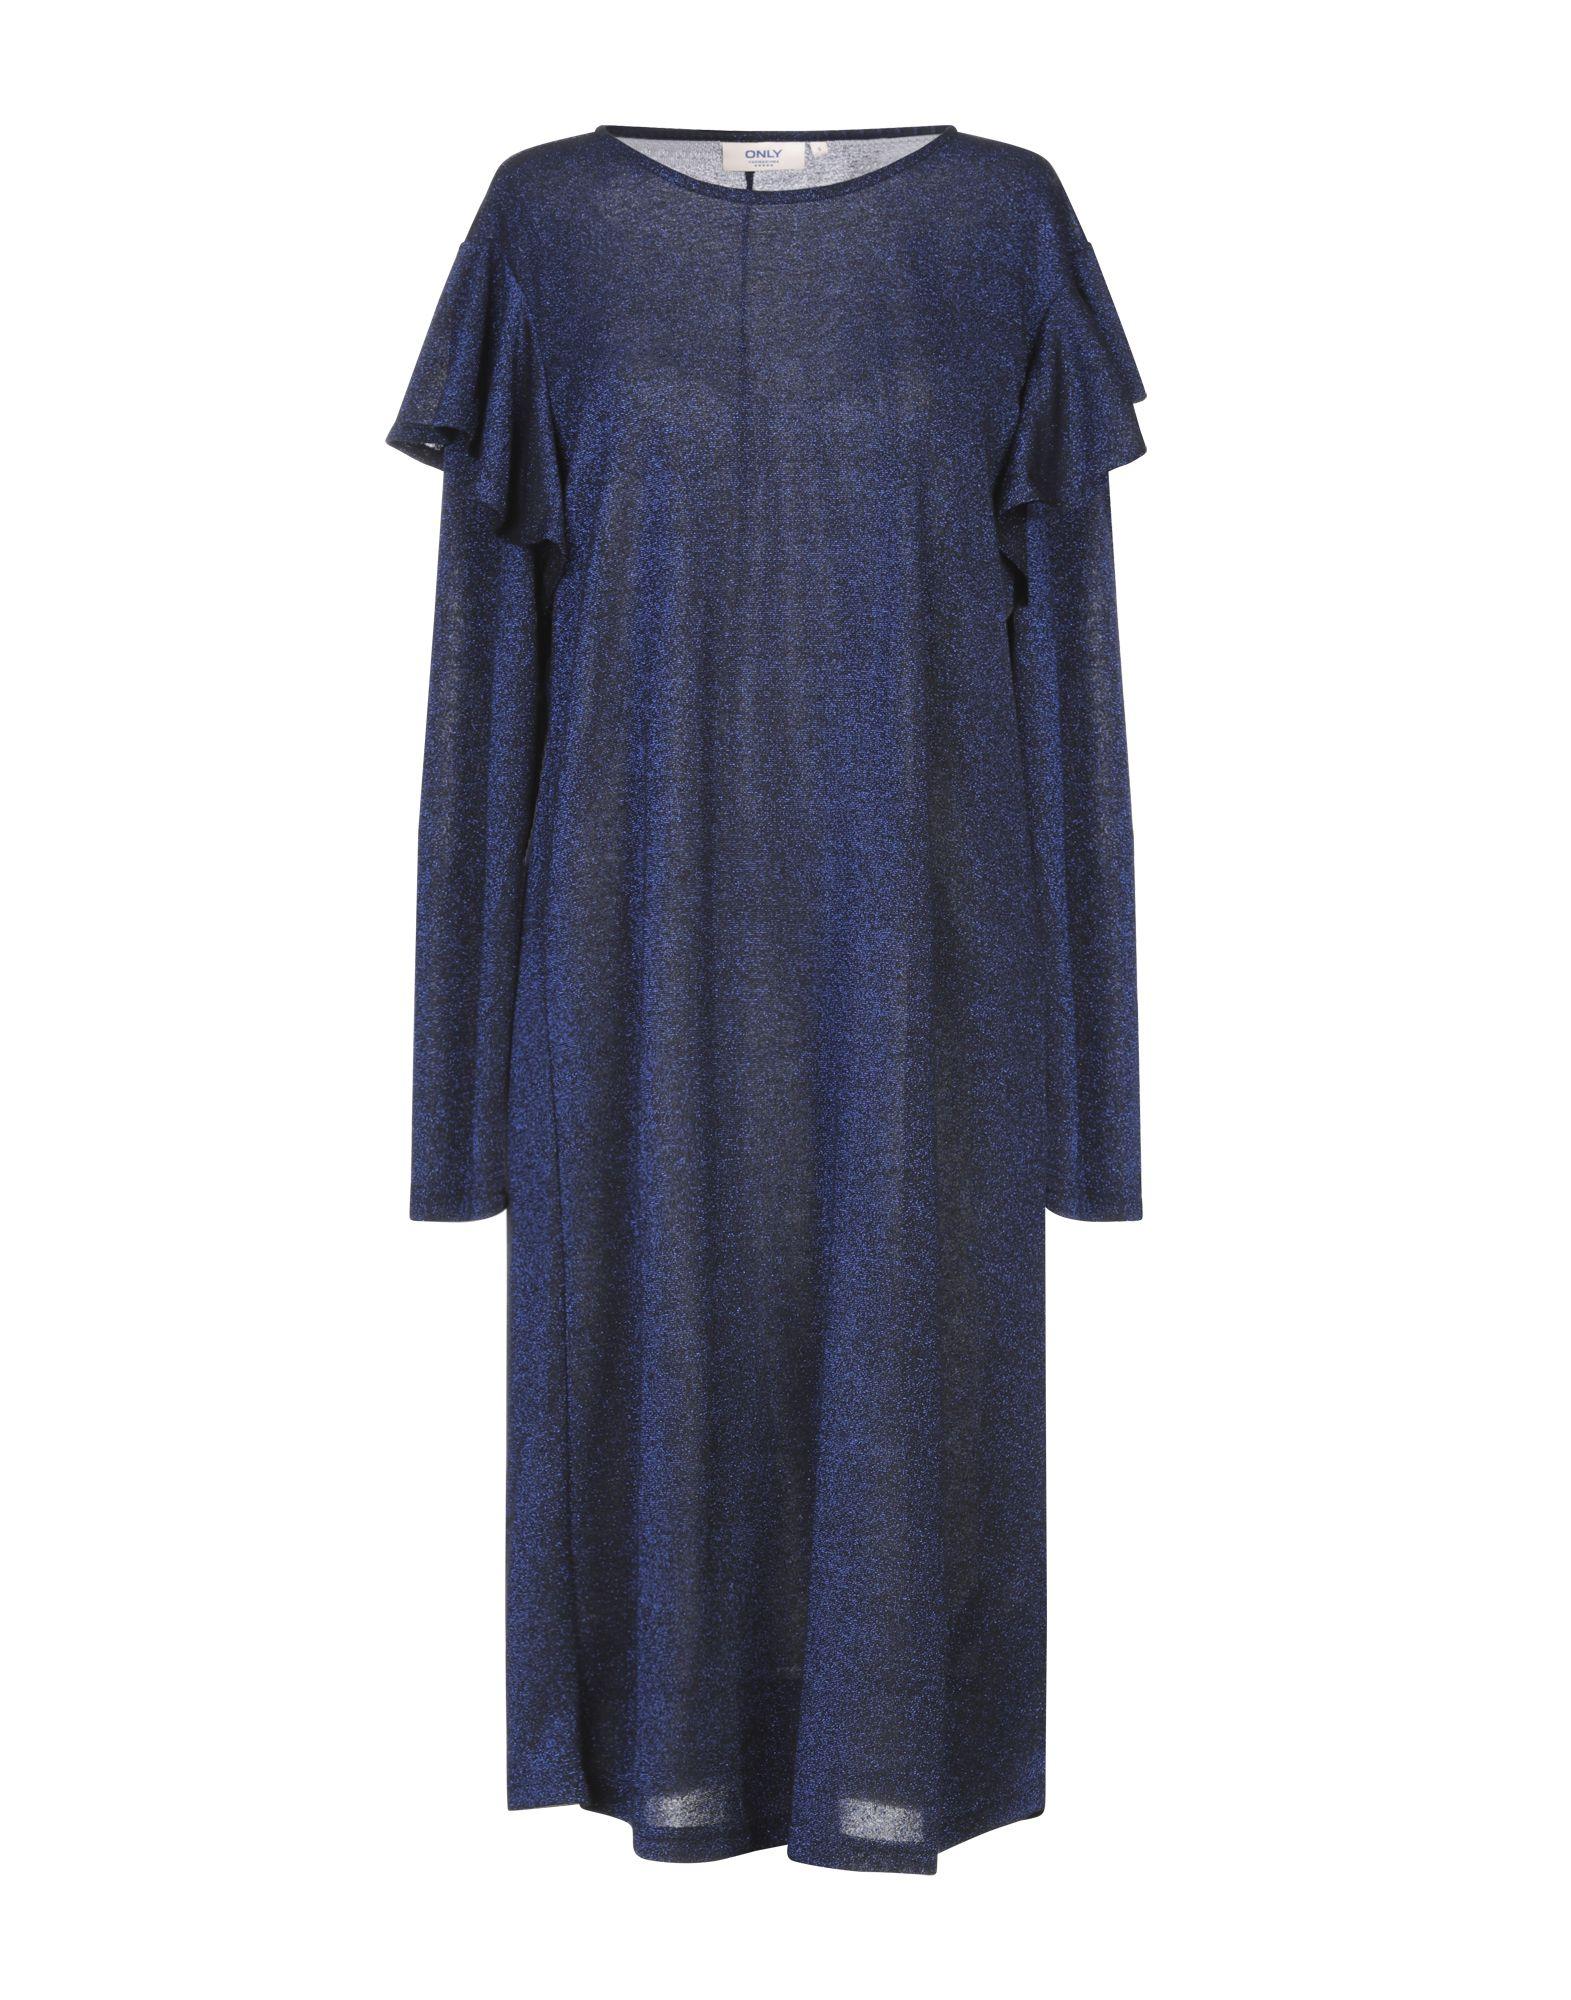 Платье до колена  - Желтый,Синий цвет